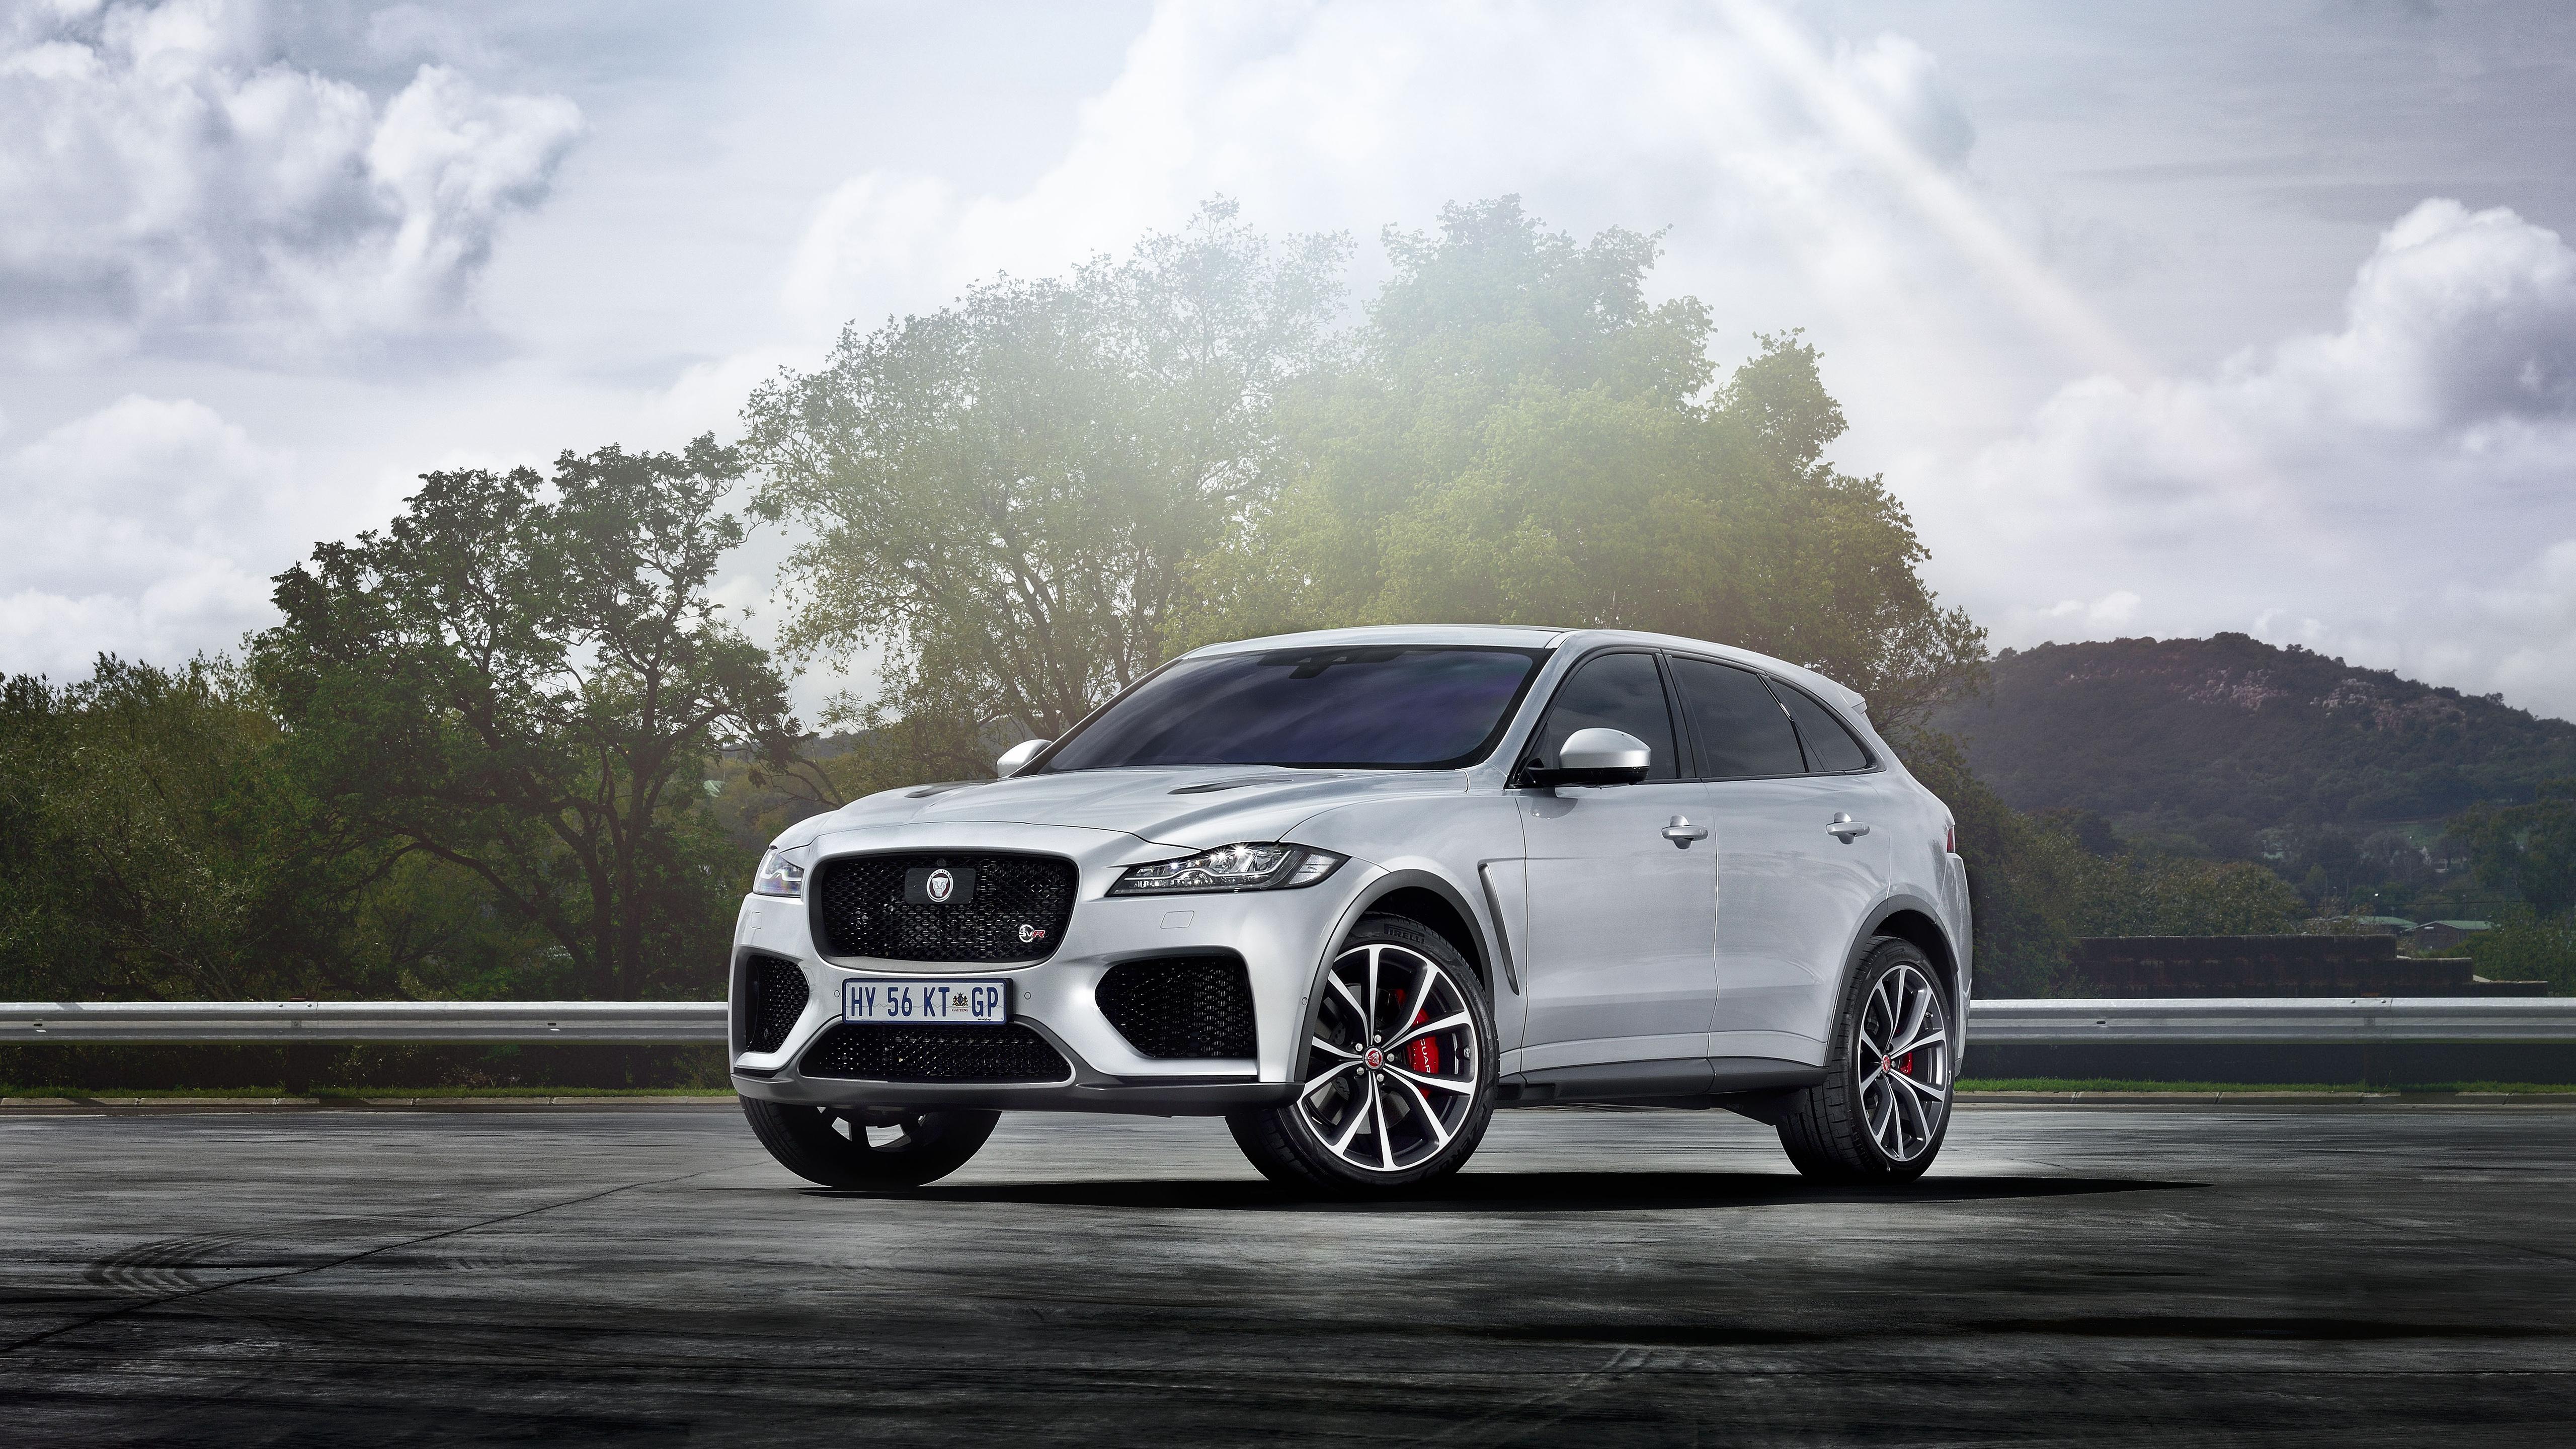 Jaguar F-Pace SVR 2019 5K Wallpaper   HD Car Wallpapers ...